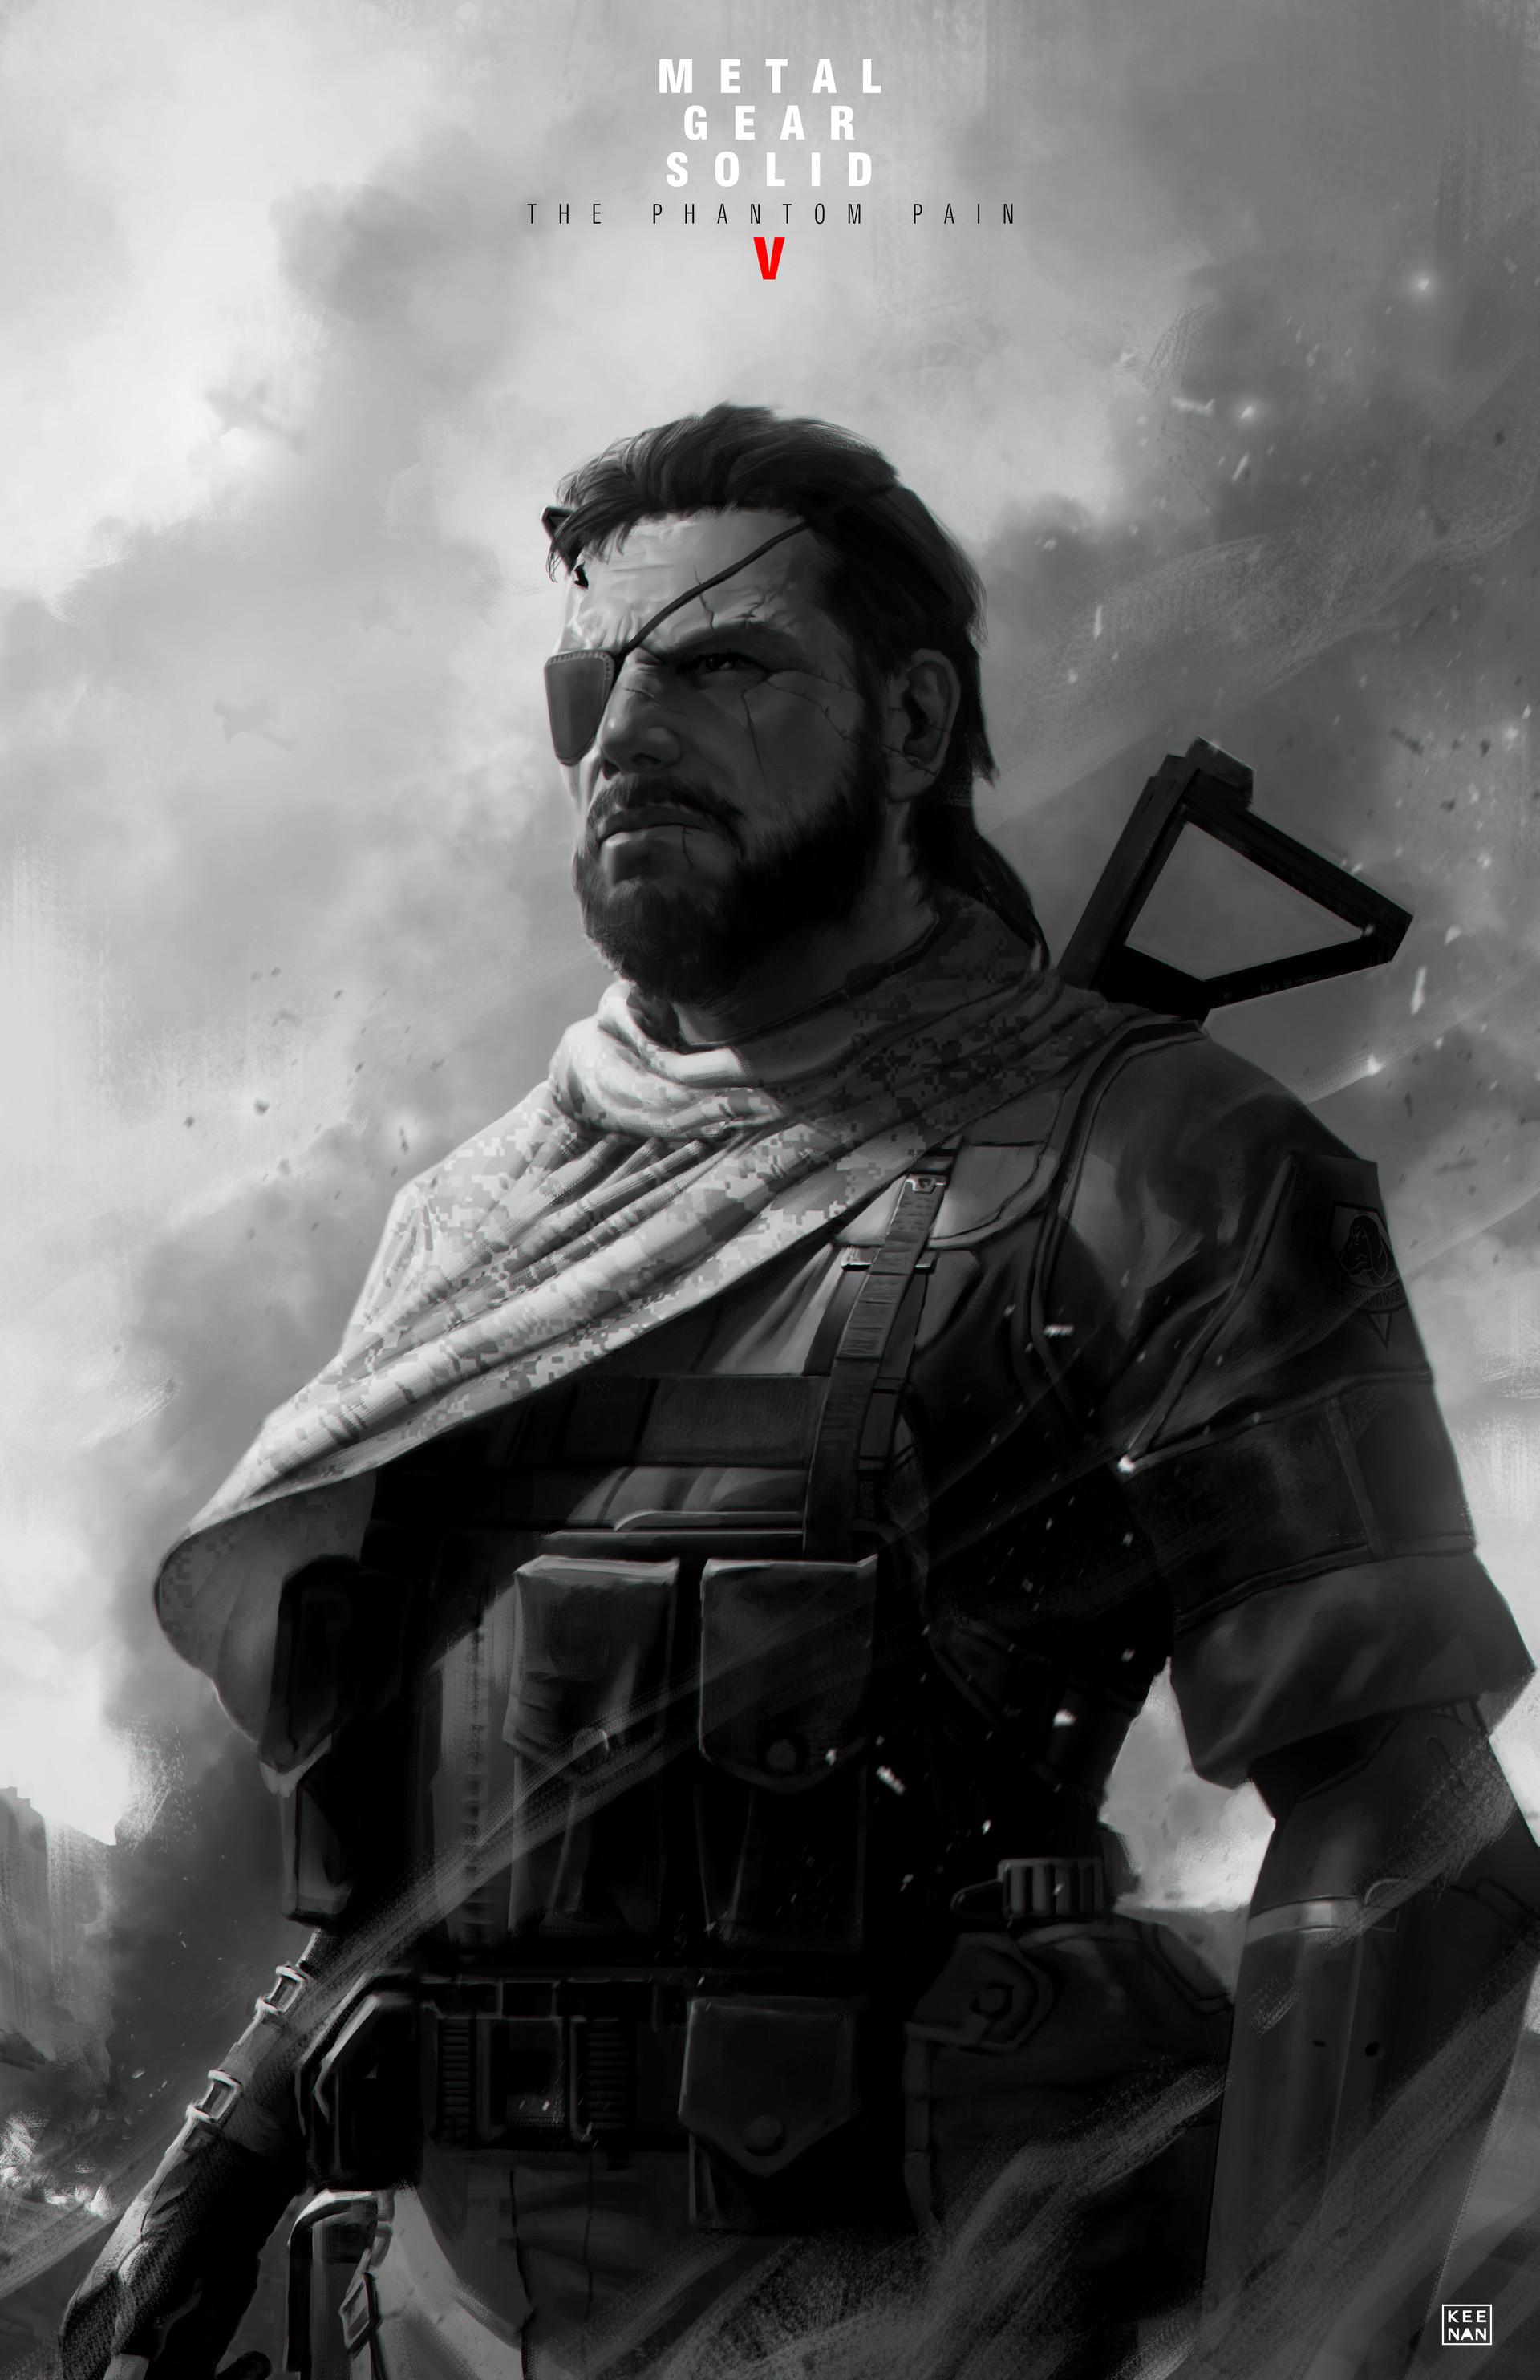 Metal Gear Solid – A Hideo Kojima Thread – Flimsy Huey and the Phooey  Fallacy